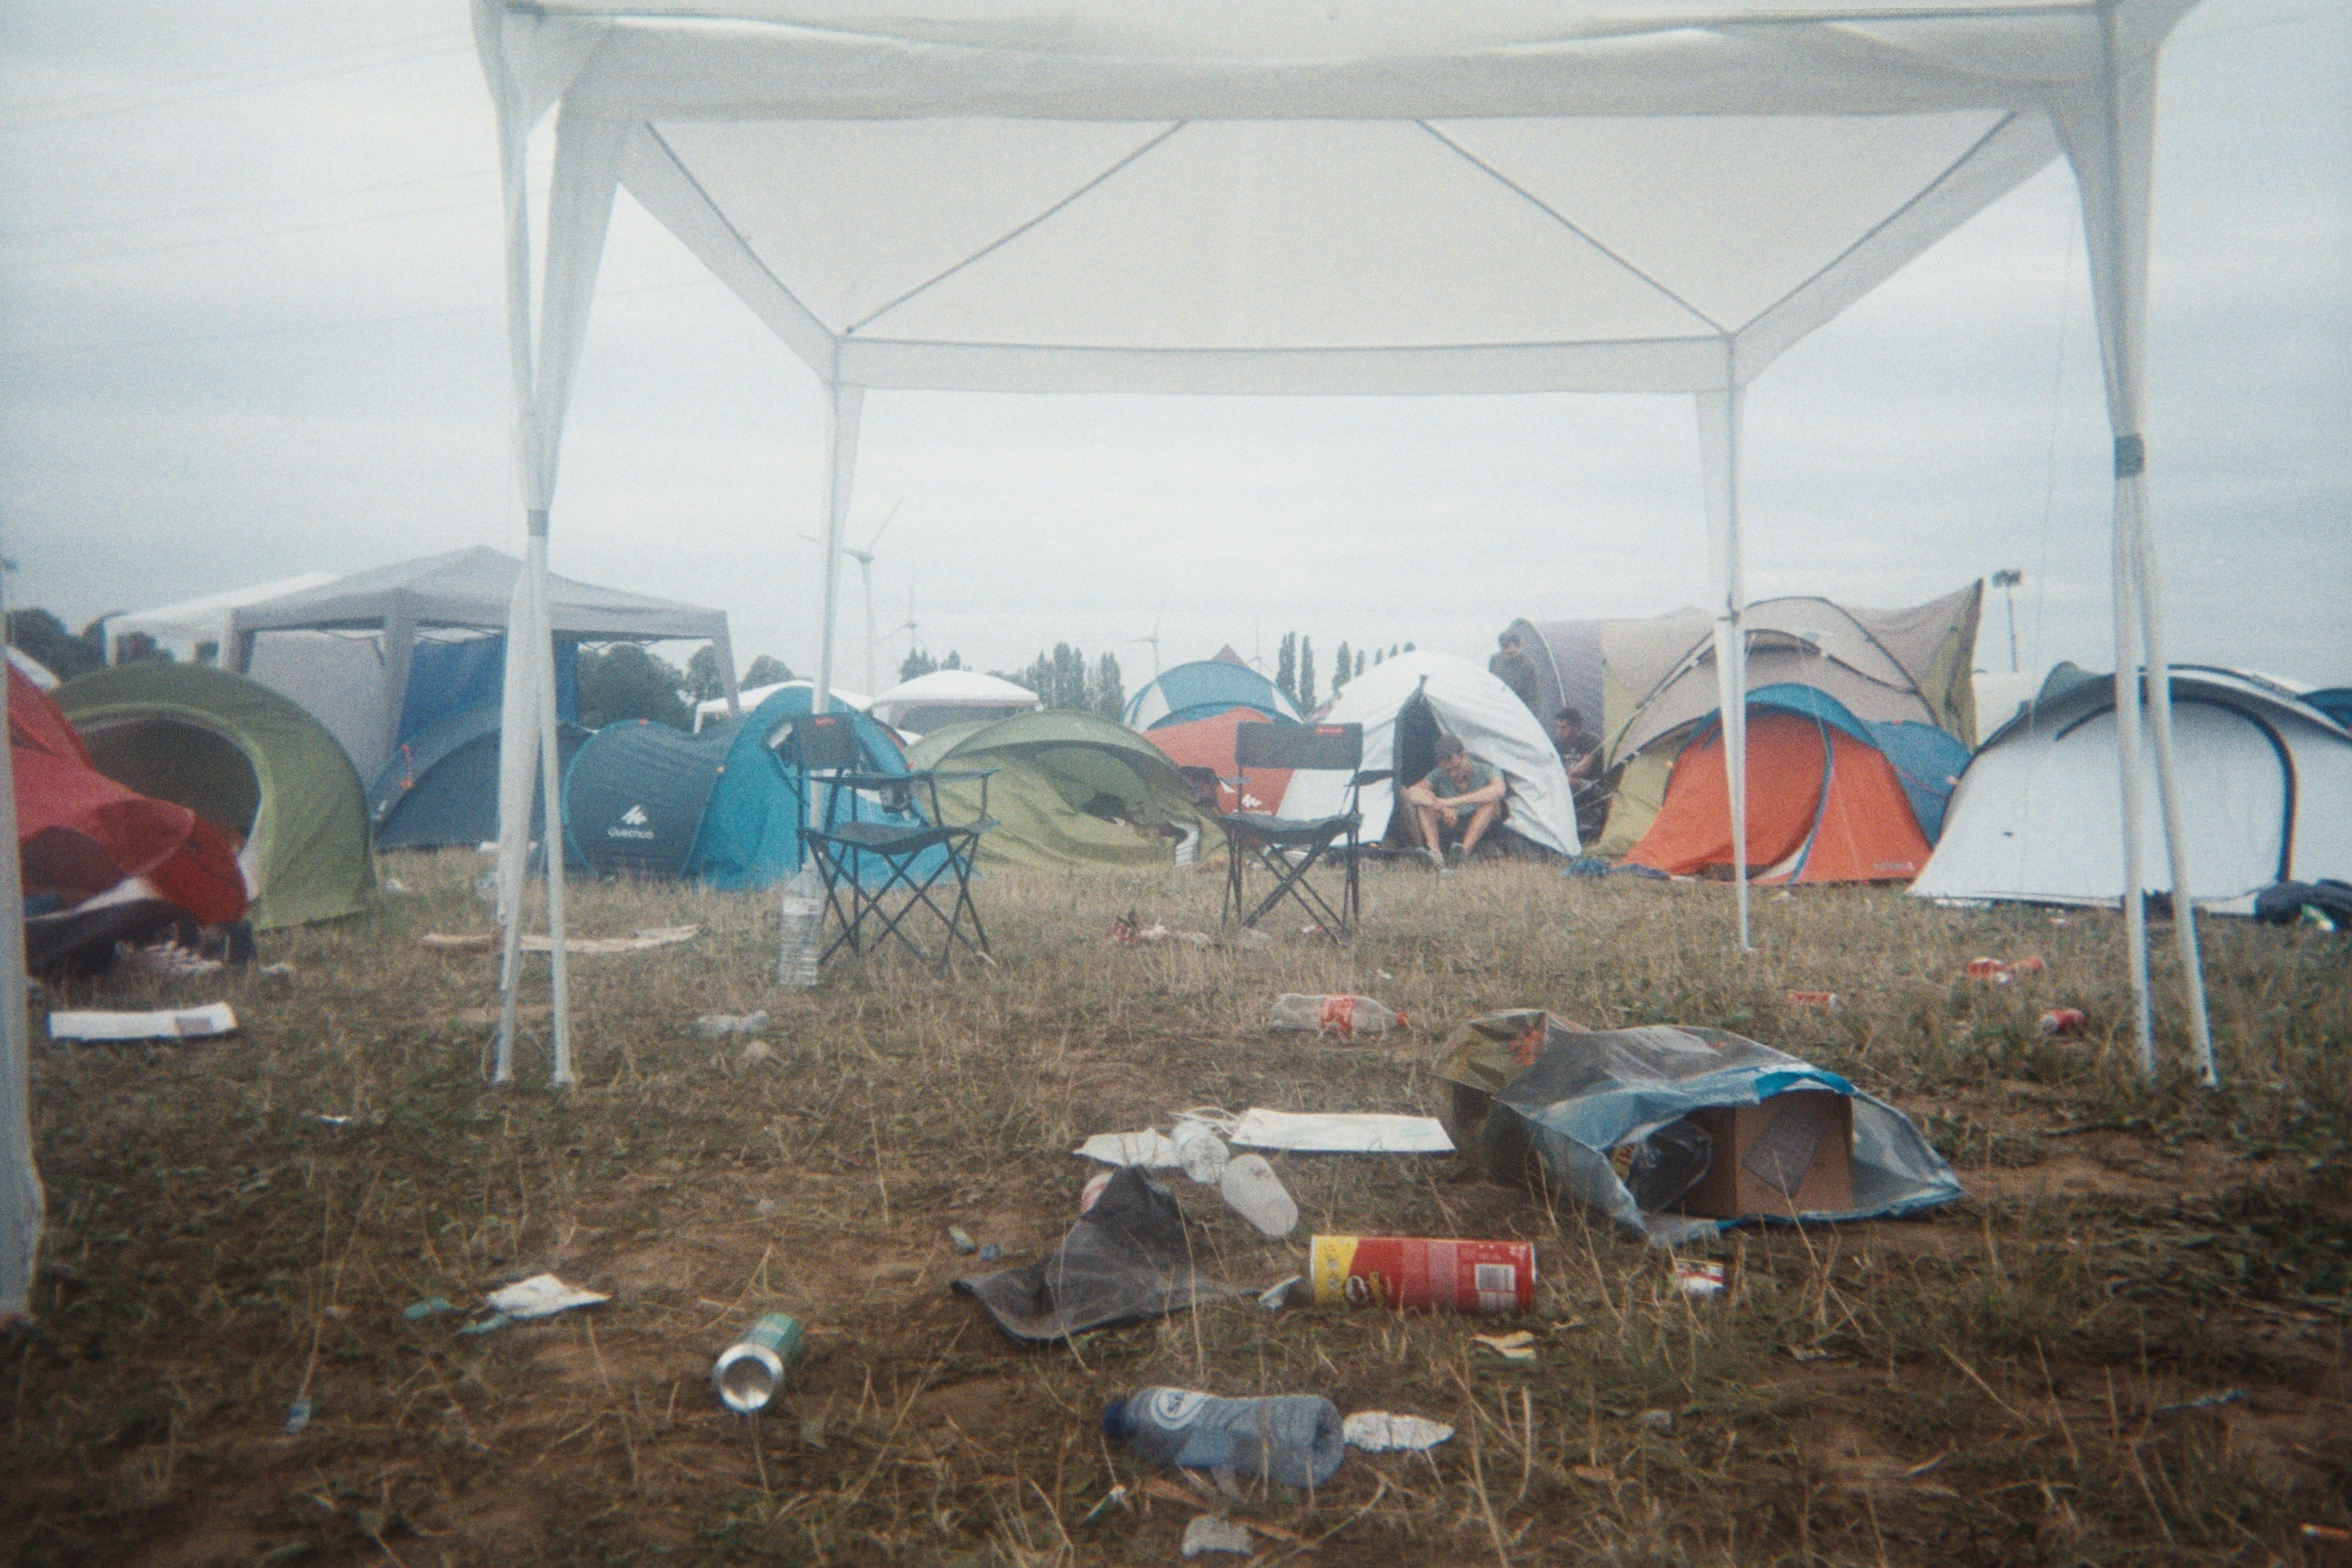 festival-Dour-dure-vie